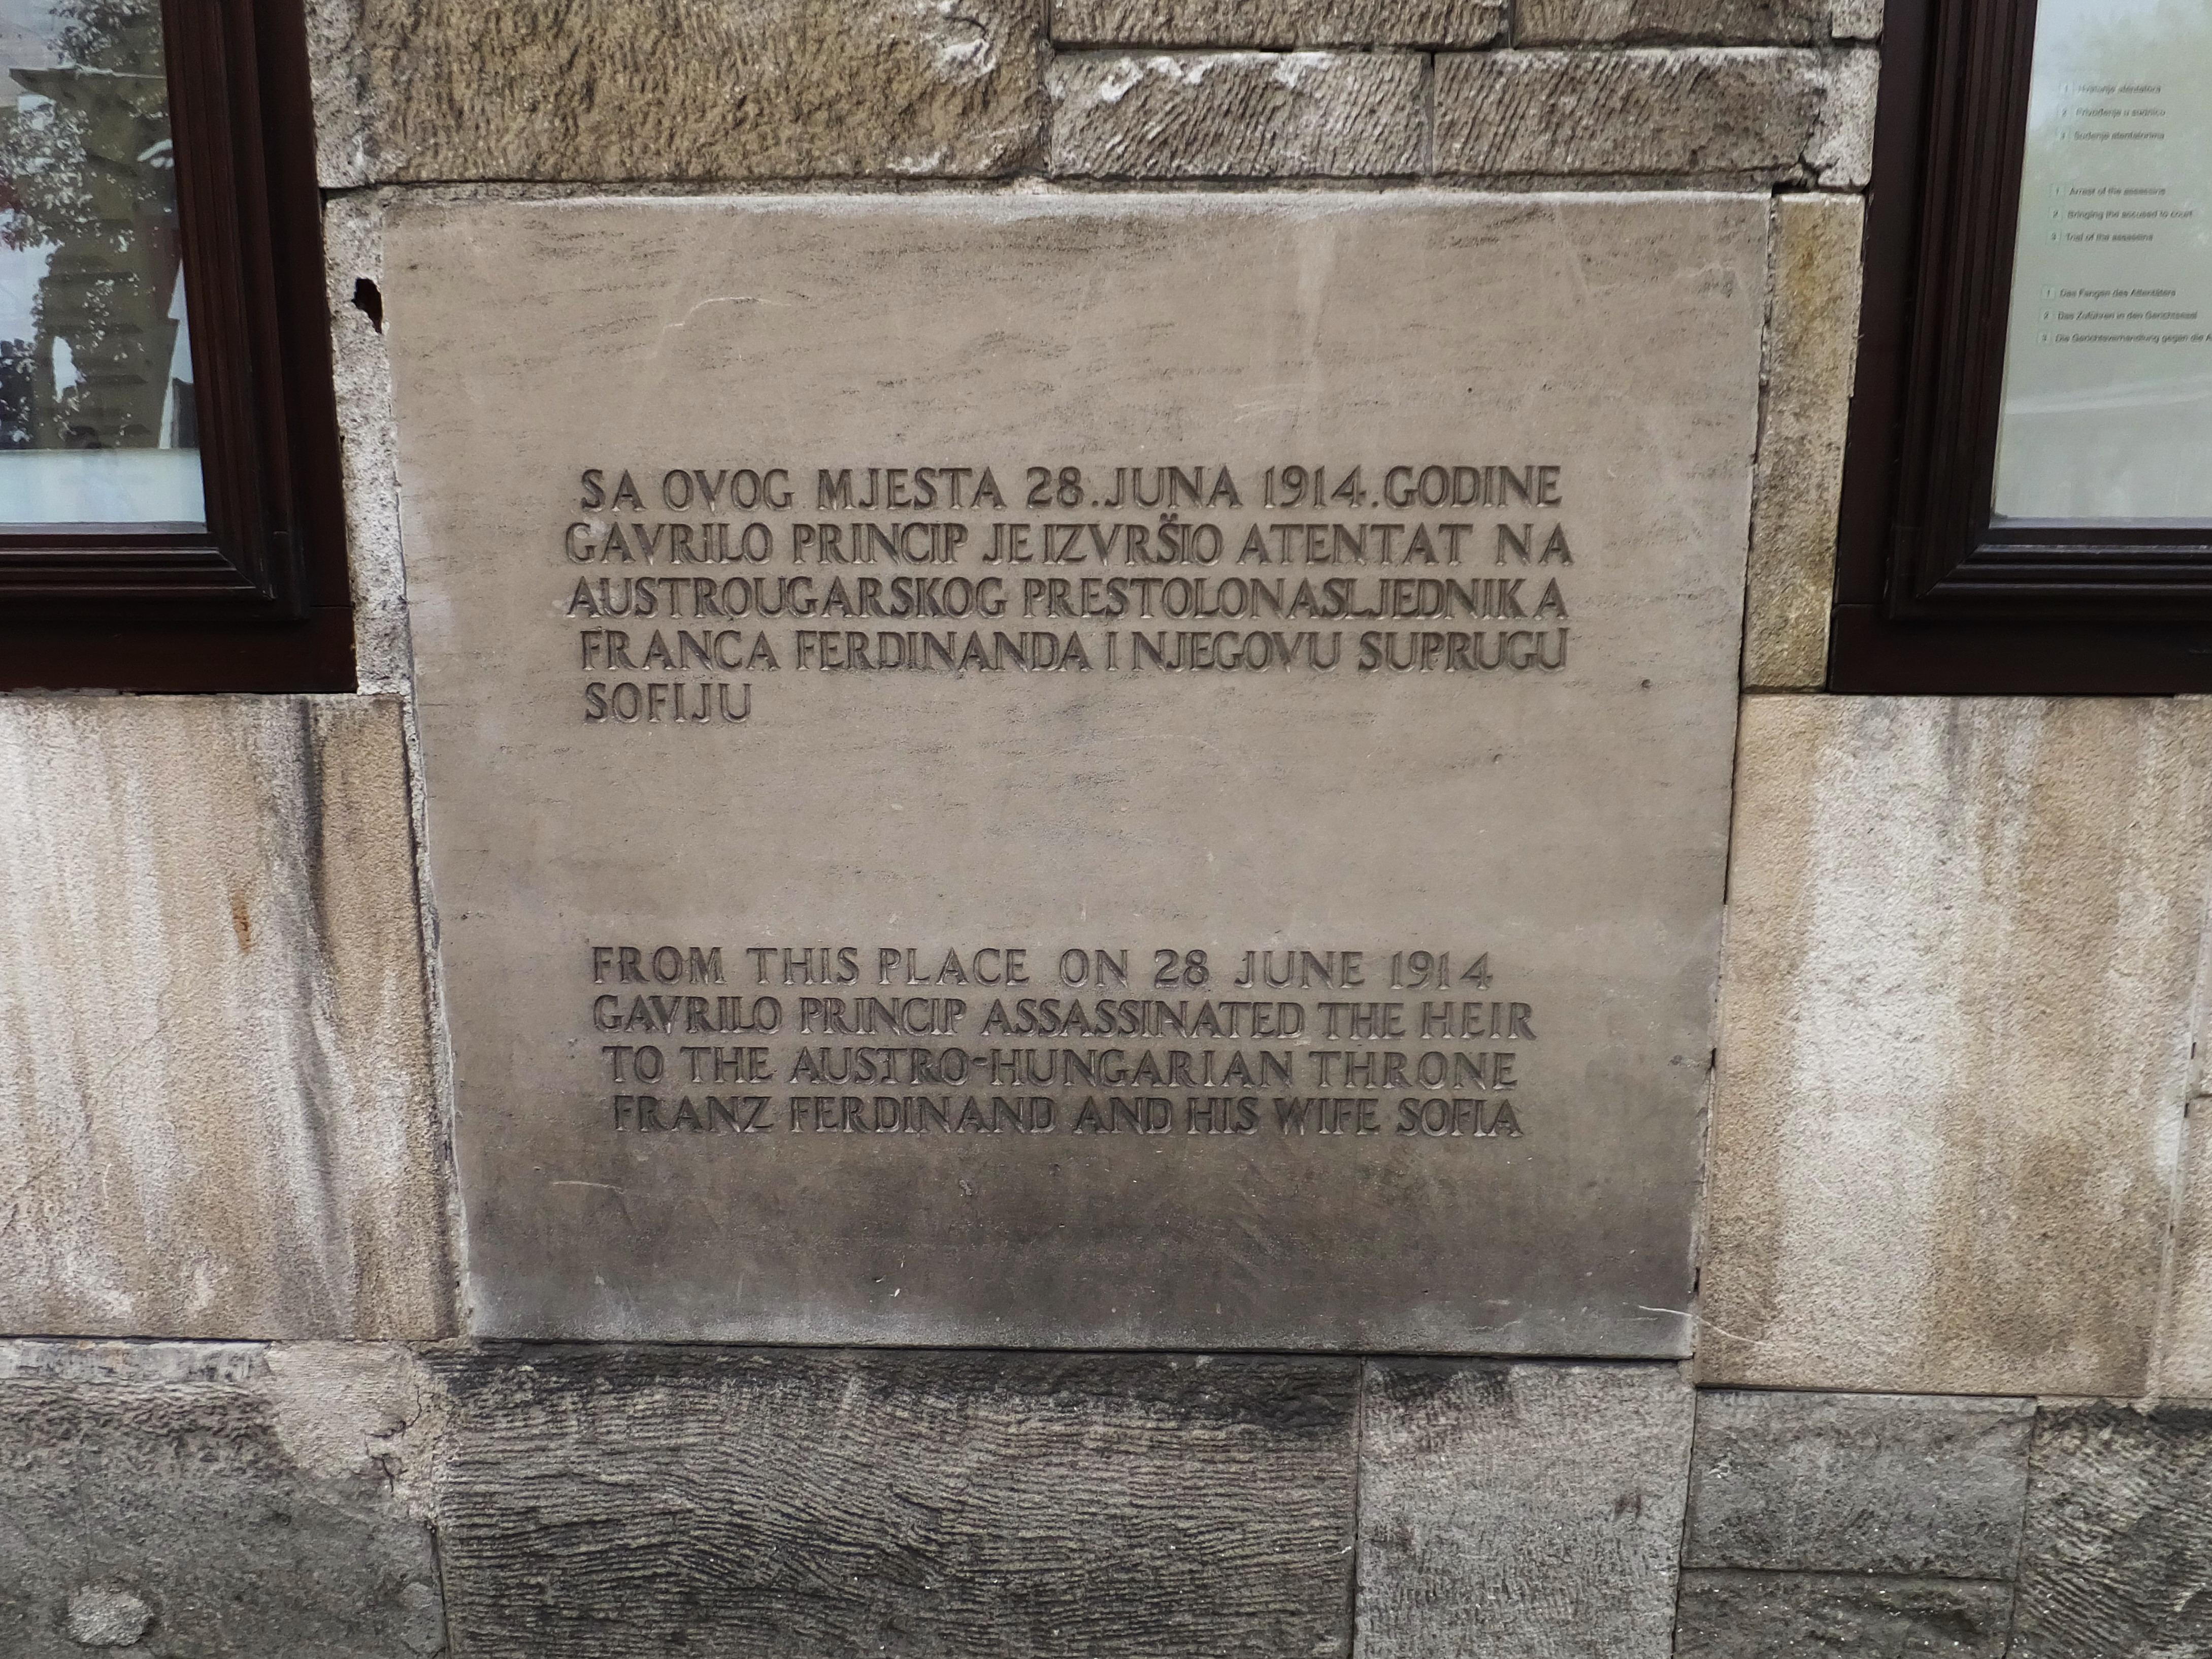 plaque memorializing franz ferdinand assassination